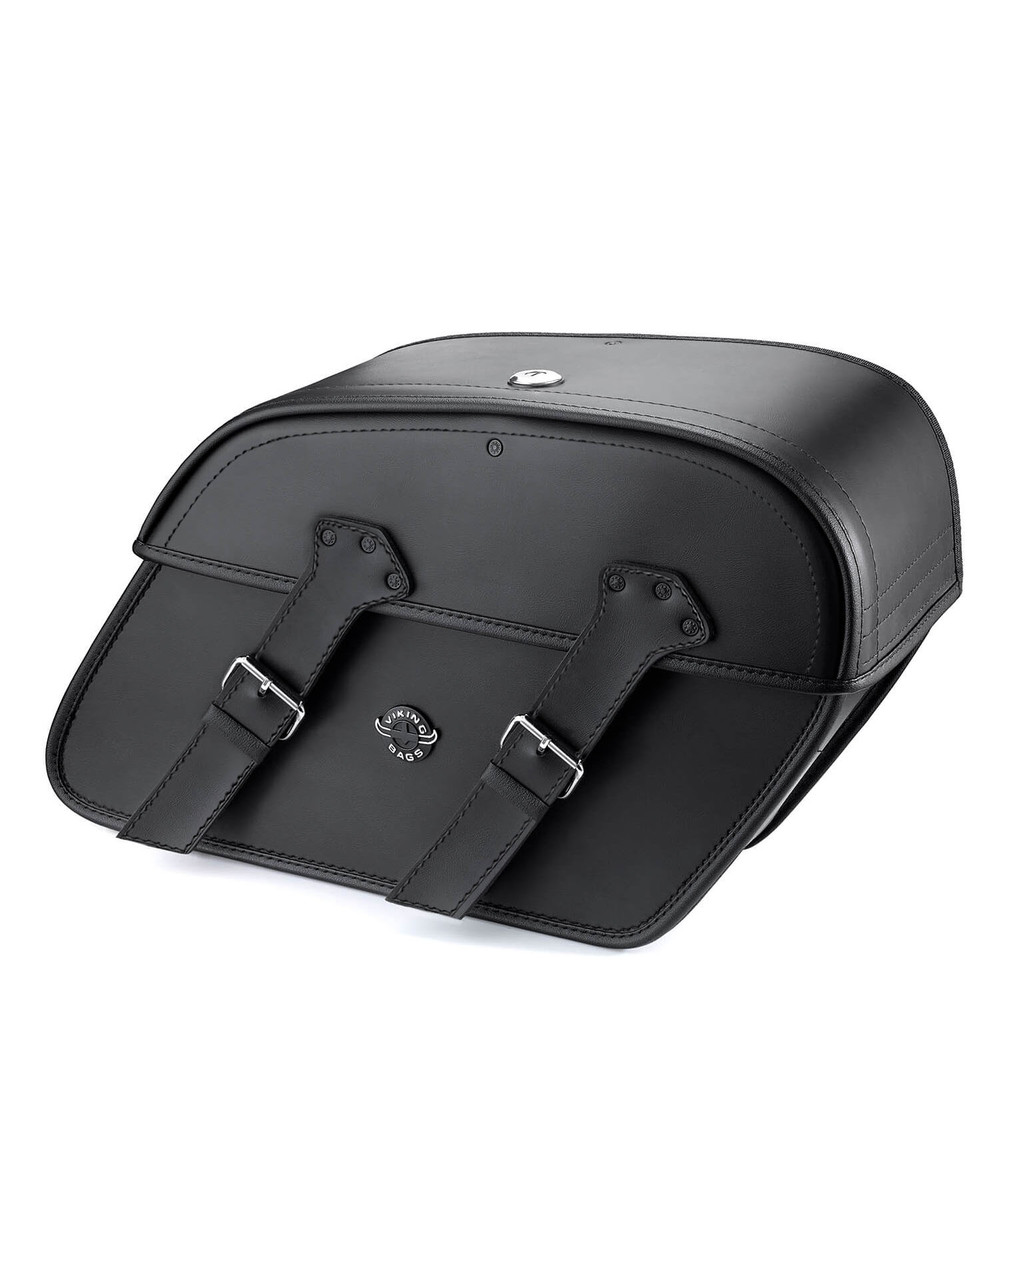 Viking Raven Medium Leather Motorcycle Saddlebags  For Harley Softail Cross Bones FLSTSB Main Bag View